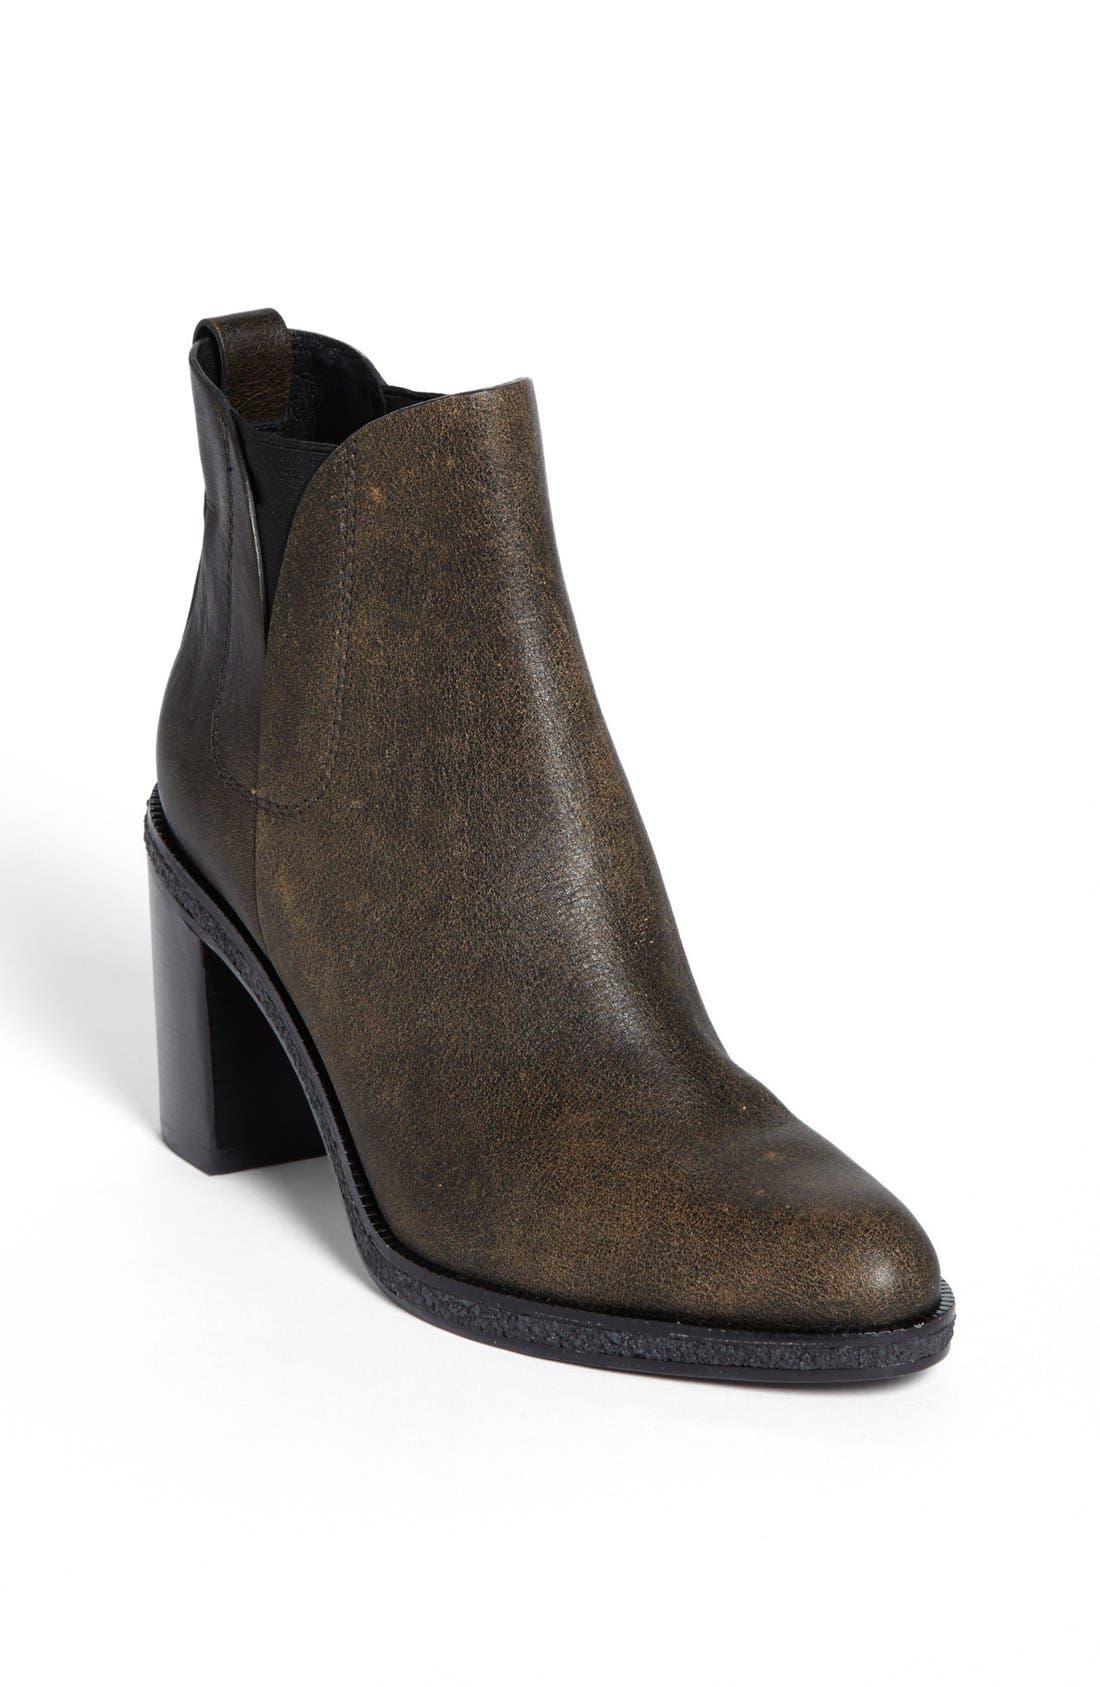 Alternate Image 1 Selected - Alexander Wang 'Irina' Ankle Boot